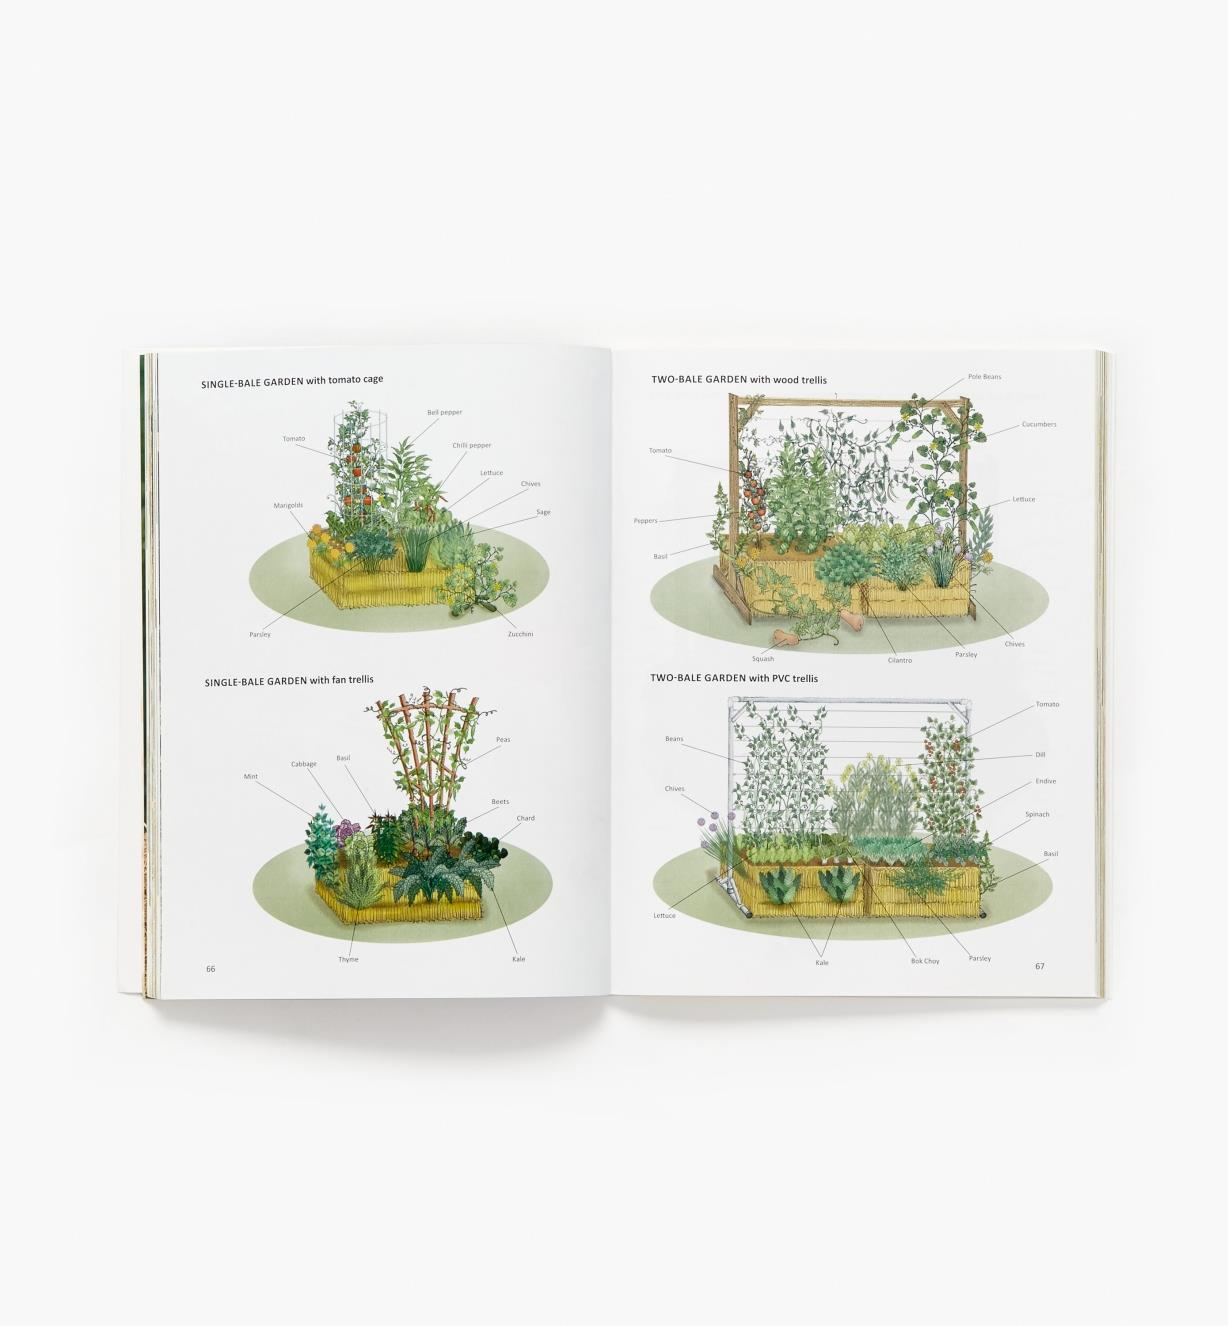 LA770 - Straw Bale Gardens Complete